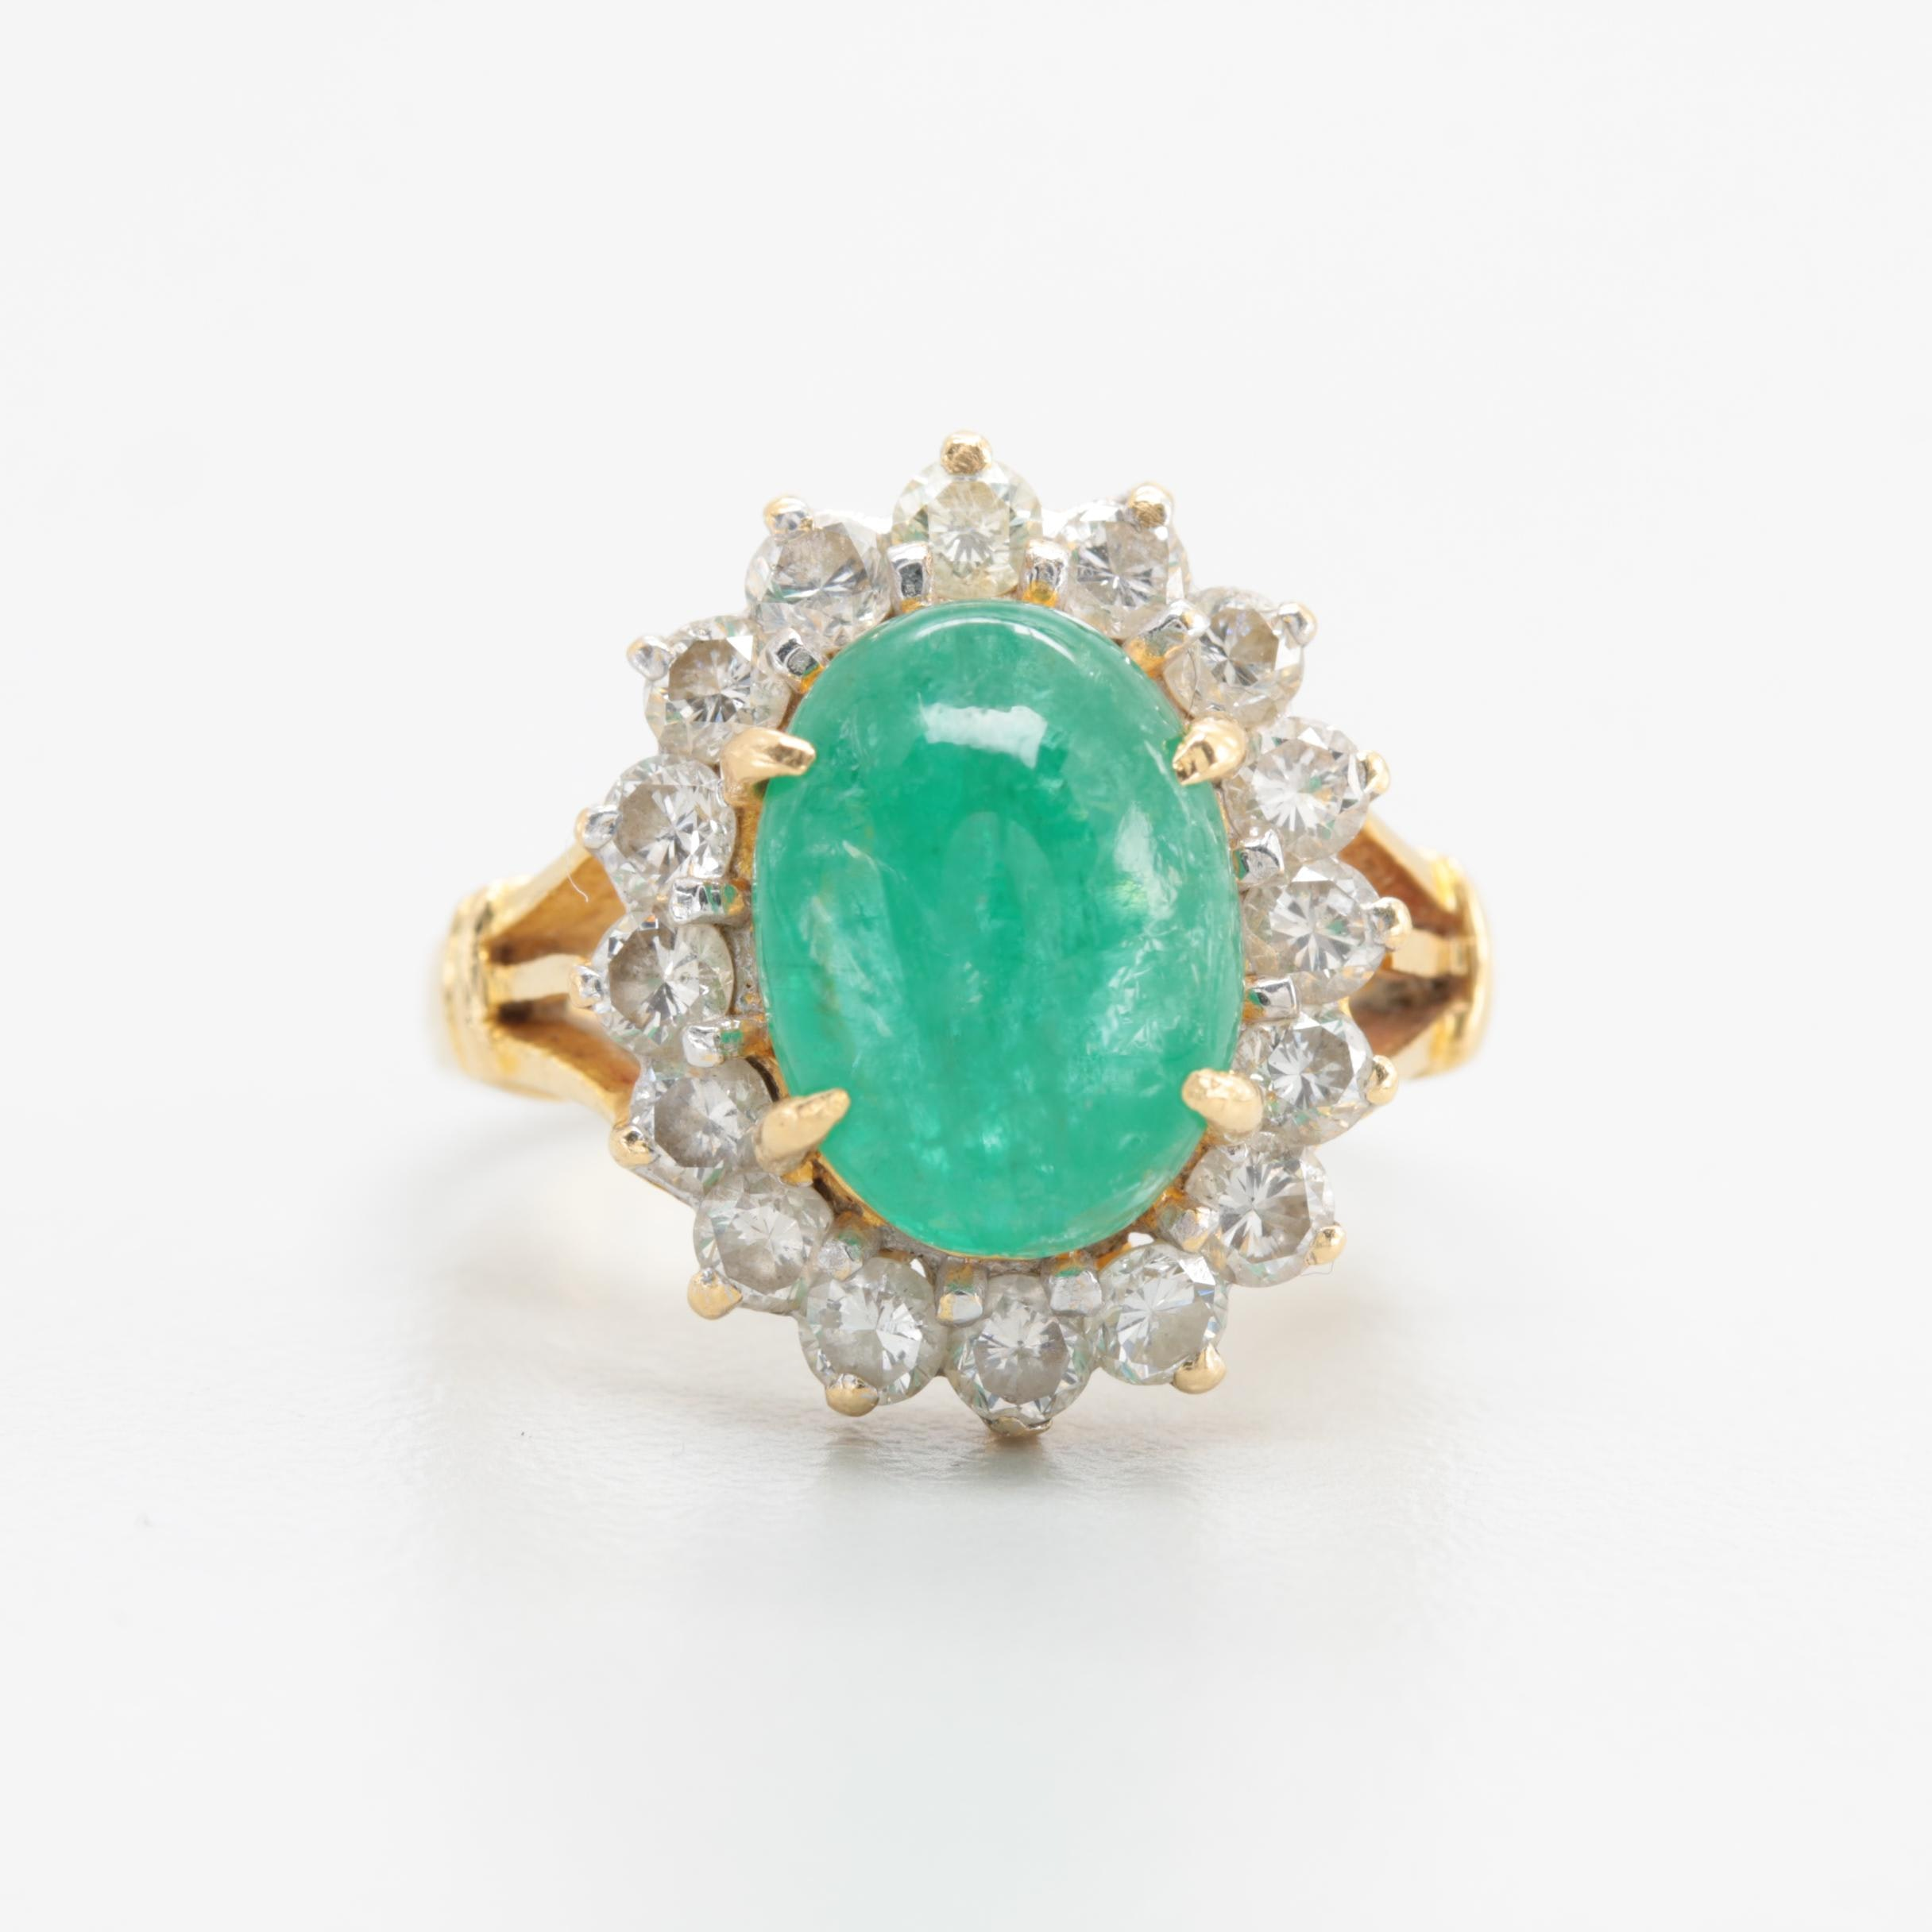 18K Yellow Gold 3.89 CT Emerald and 1.04 CTW Diamond Ring